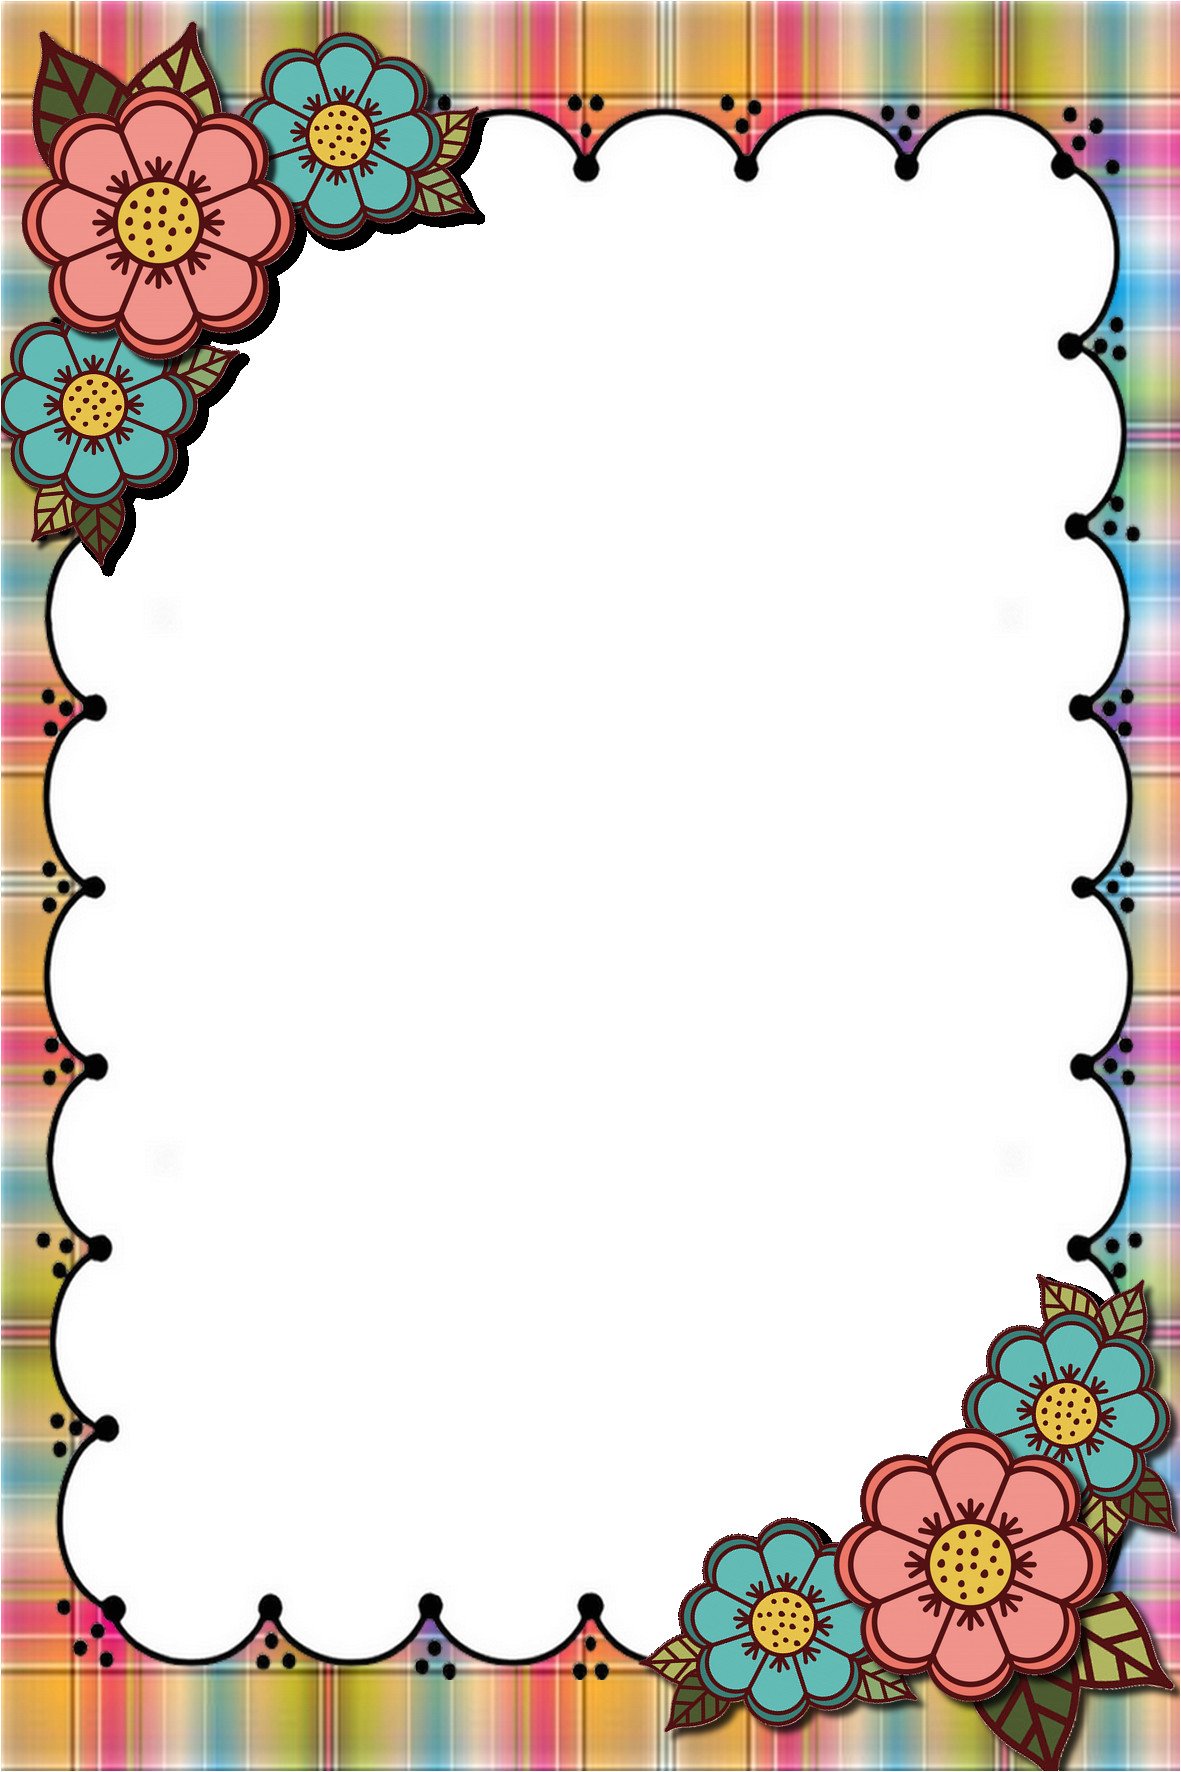 Border Design for Teachers Day Card 219 Best D D D D D D N Images In 2020 School Frame School